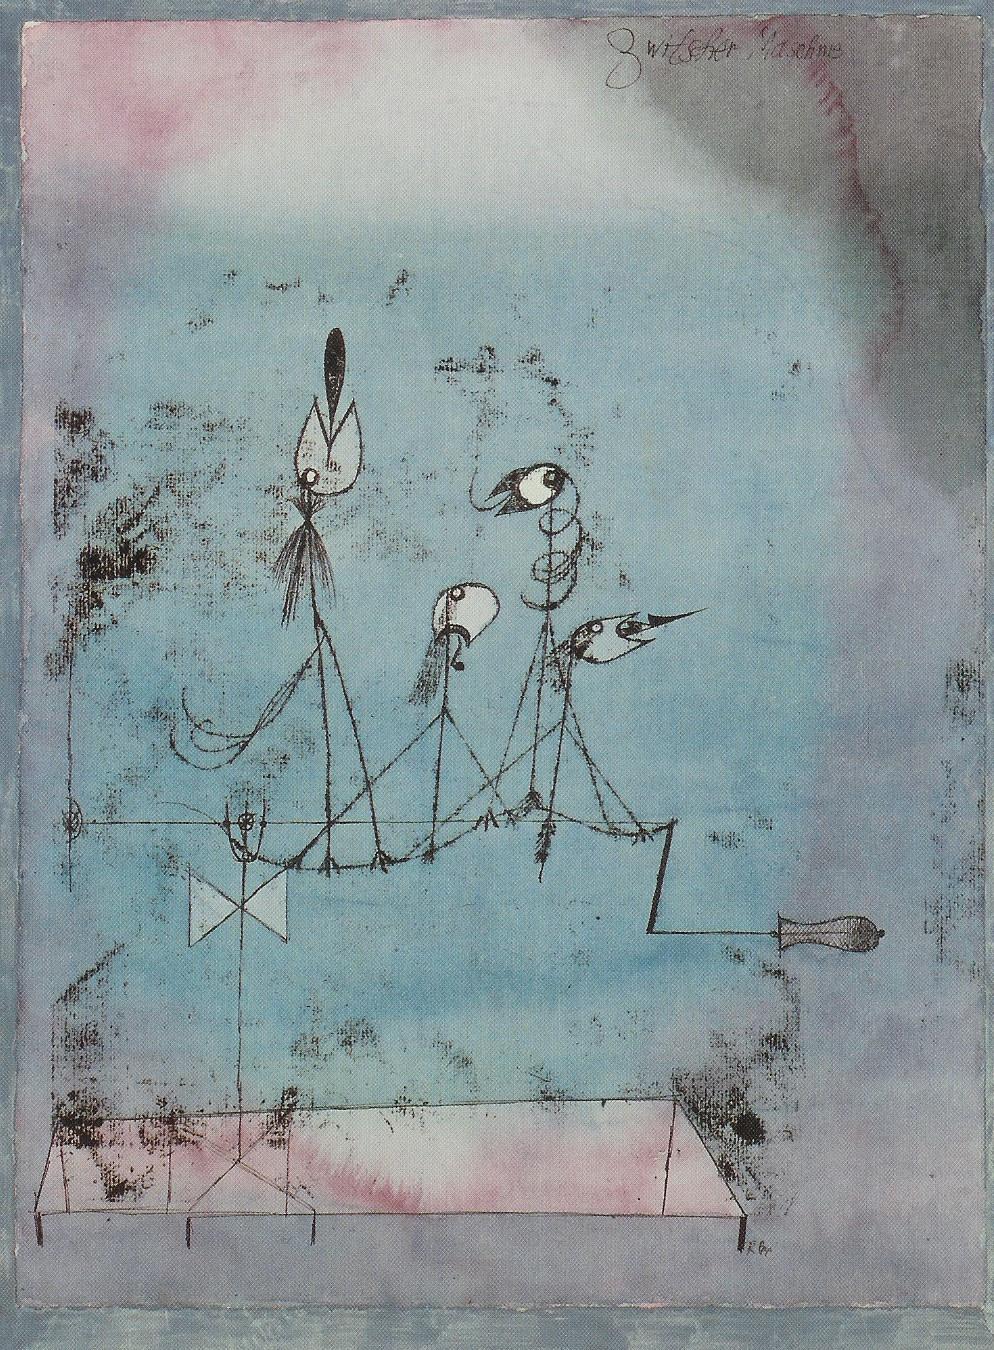 Paul Klee - Zwitschermaschine